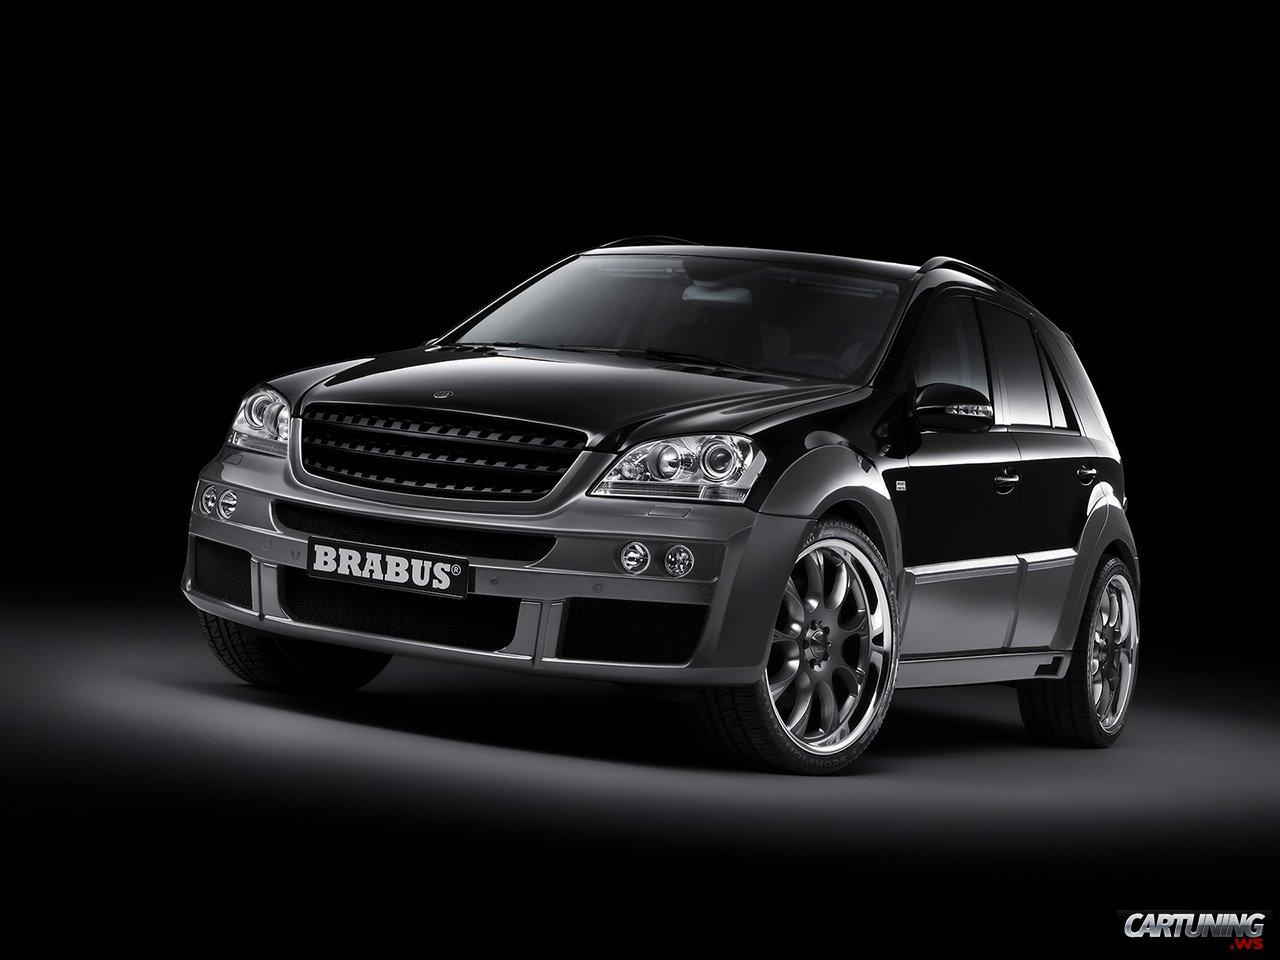 tuning mercedes benz ml 63 brabus cartuning best car. Black Bedroom Furniture Sets. Home Design Ideas